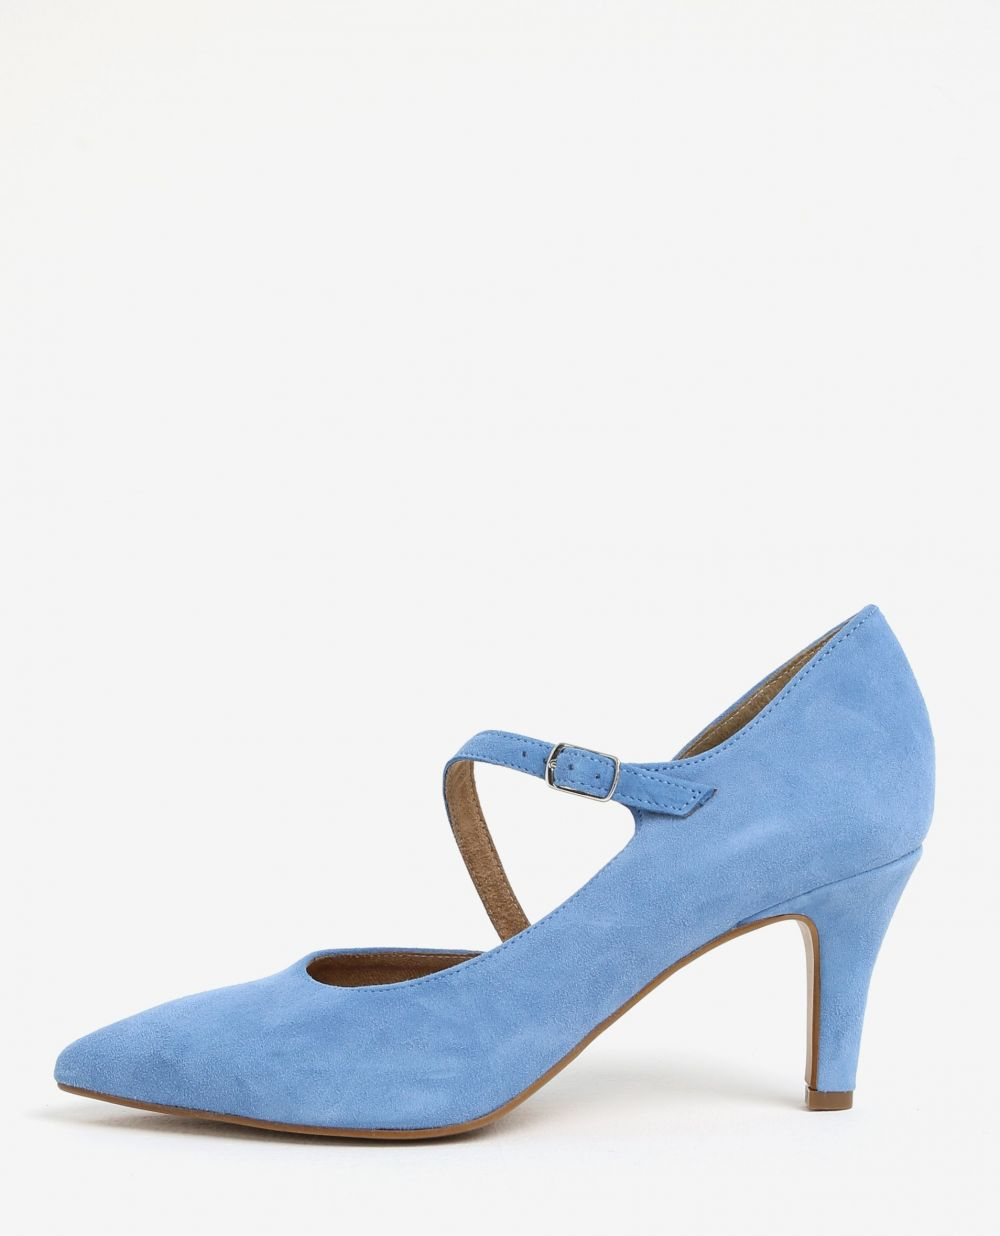 Modré semišové lodičky Tamaris značky Tamaris - Lovely.sk 43ca5a28462